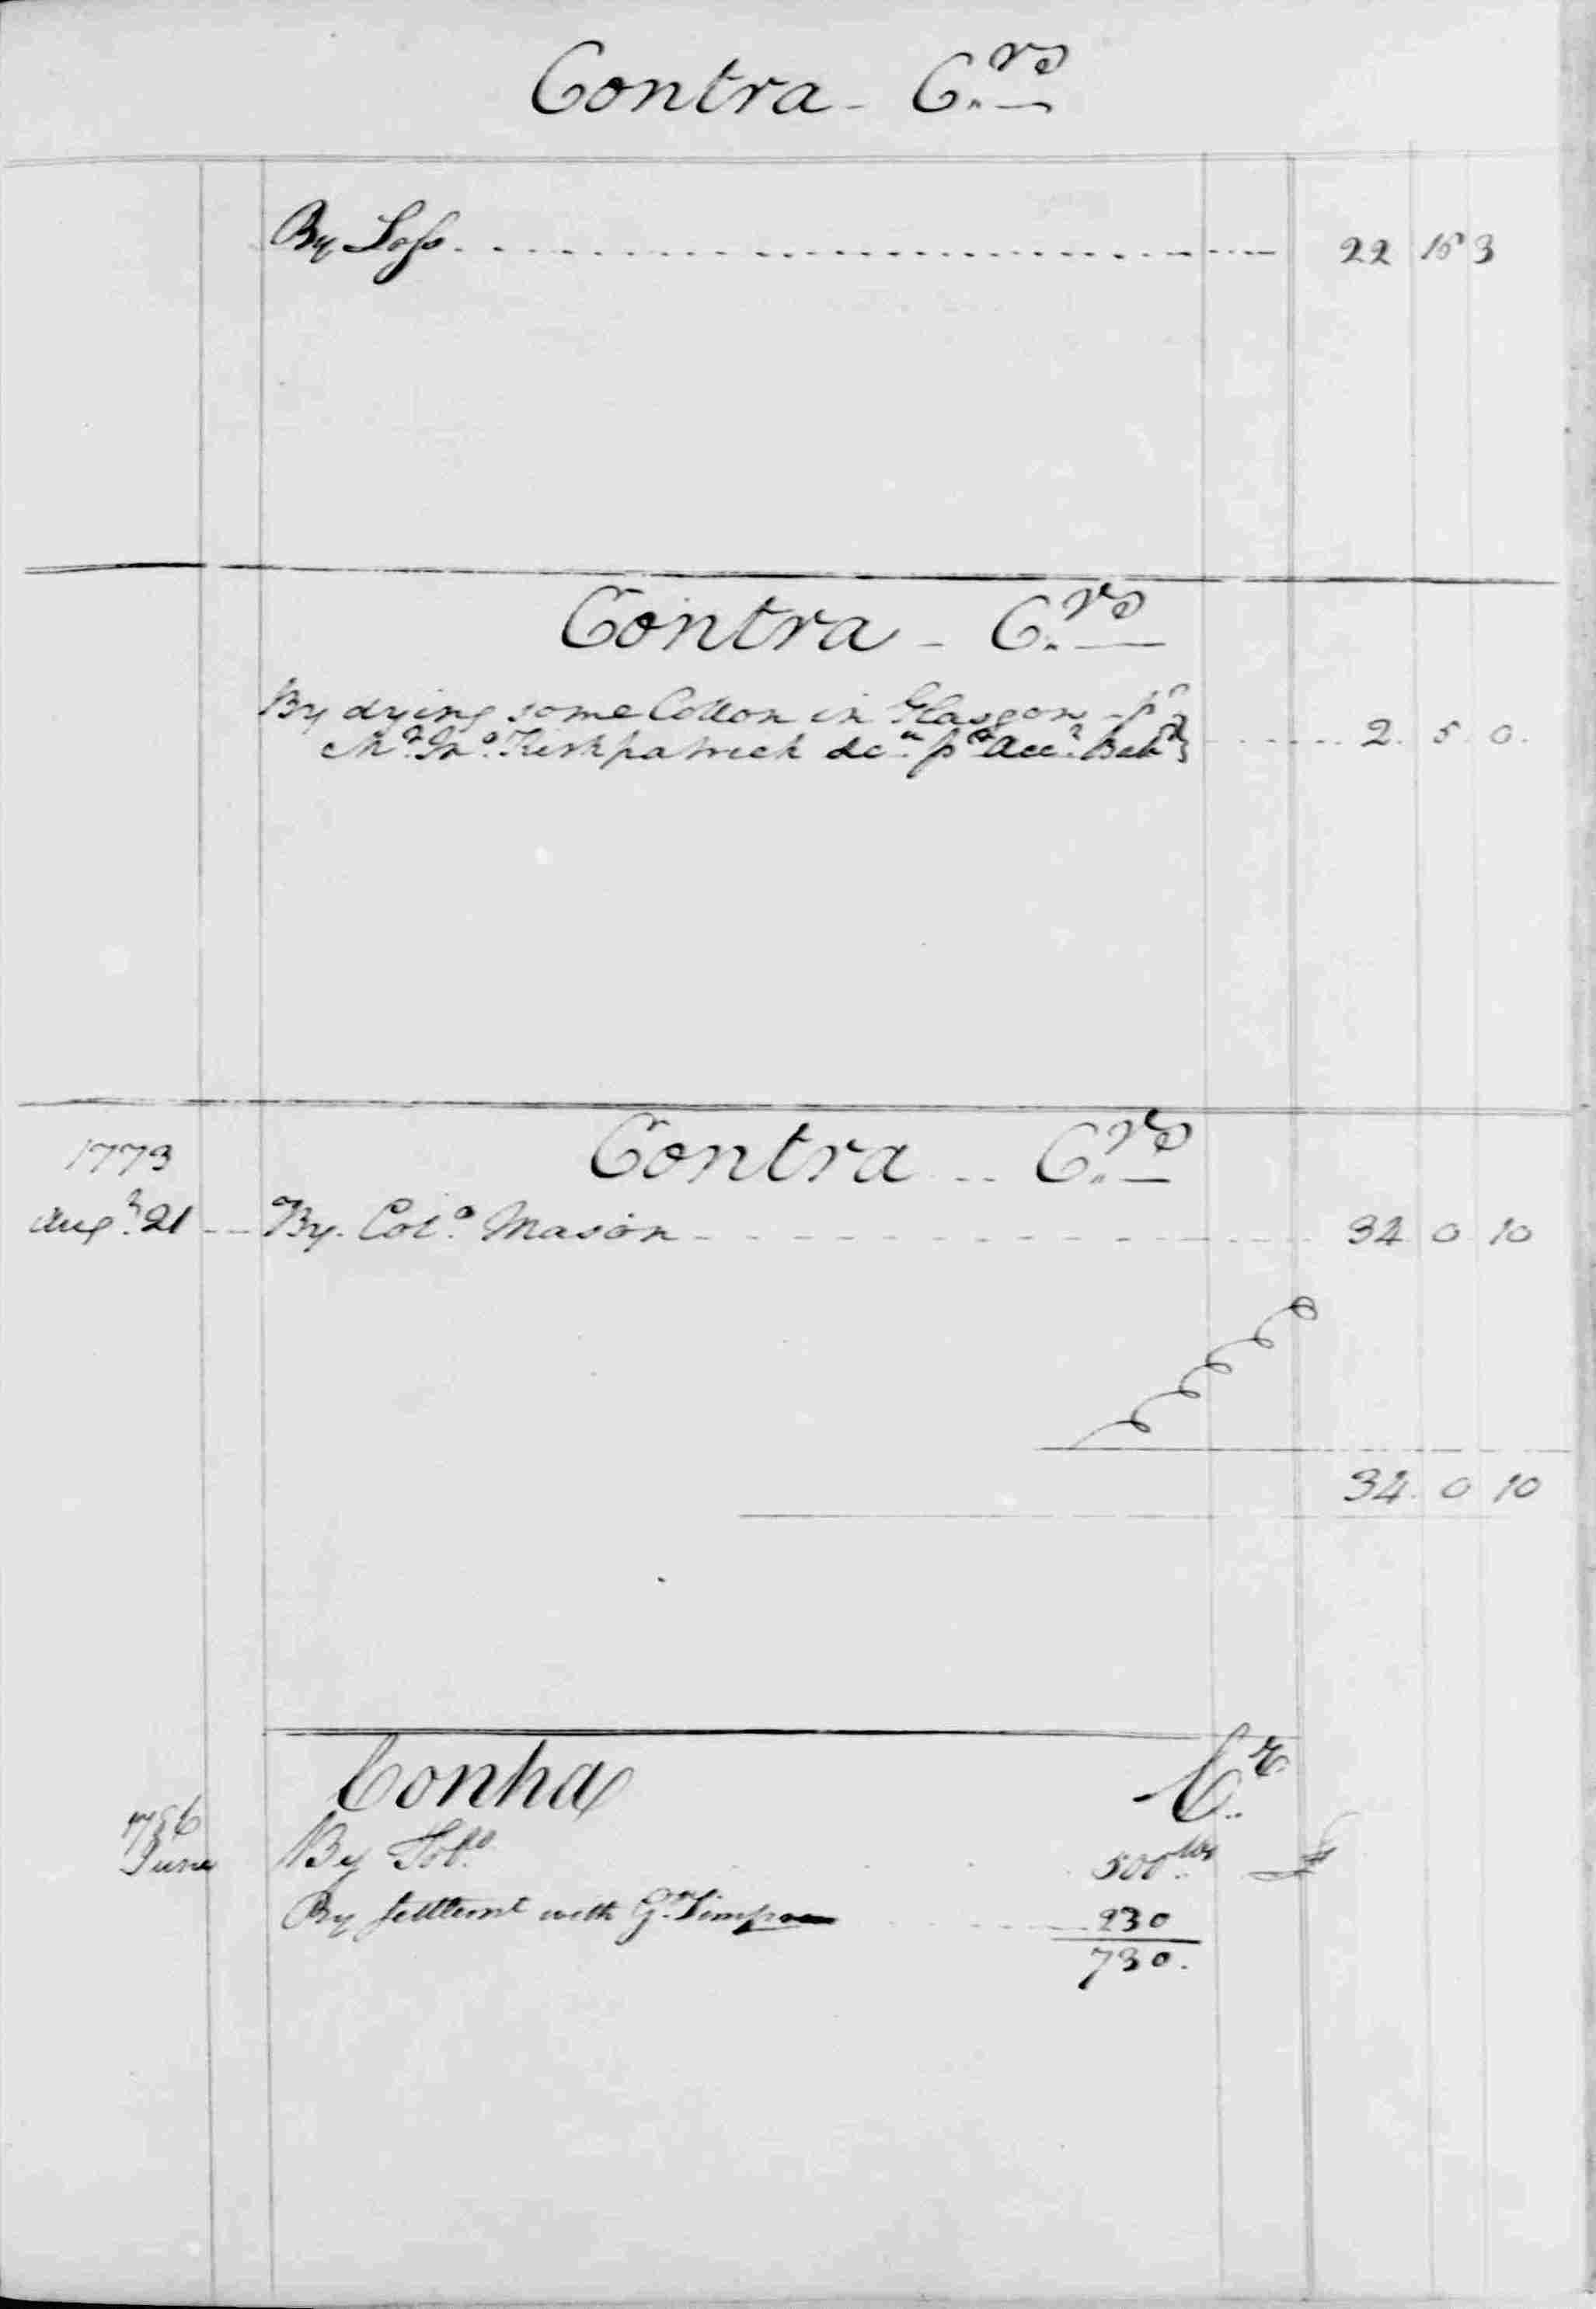 Ledger B, folio 25, right side